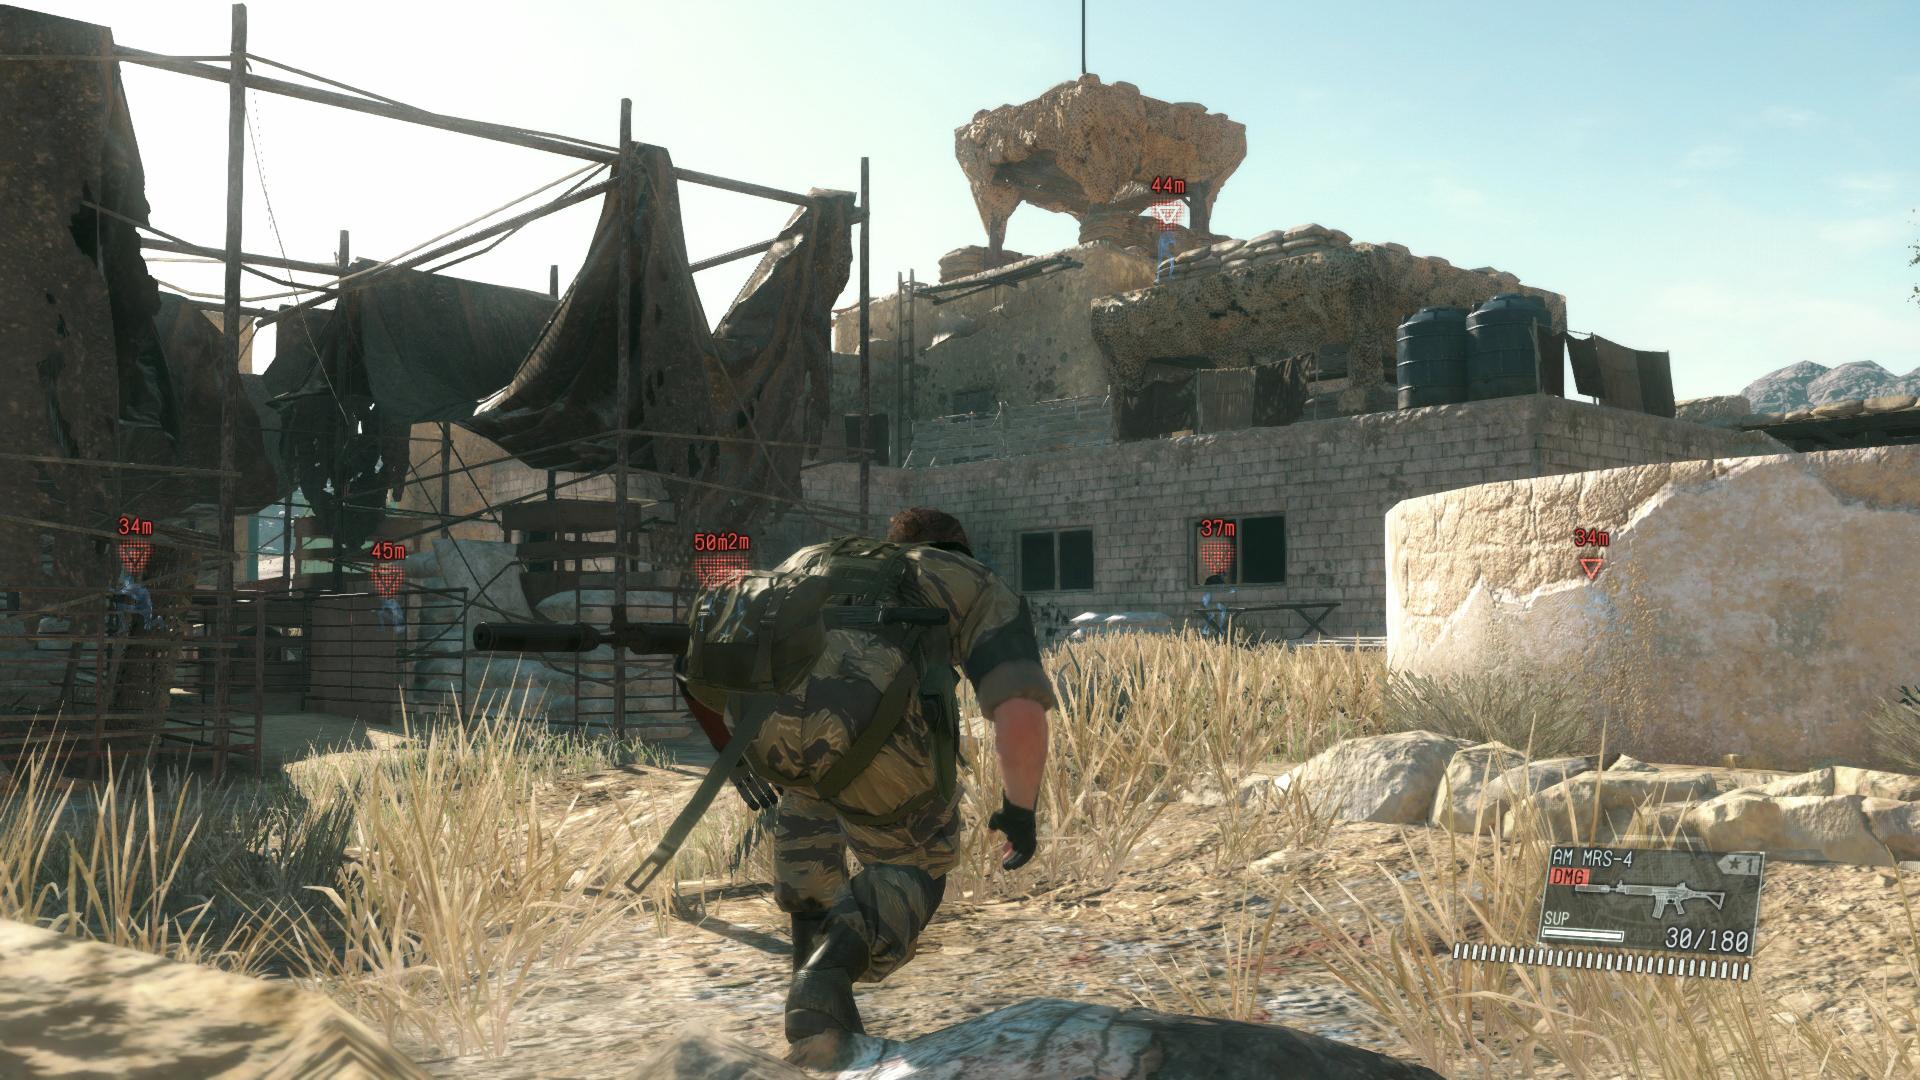 20 minut z Metal Gear Solid V: The Phantom Pain 109820